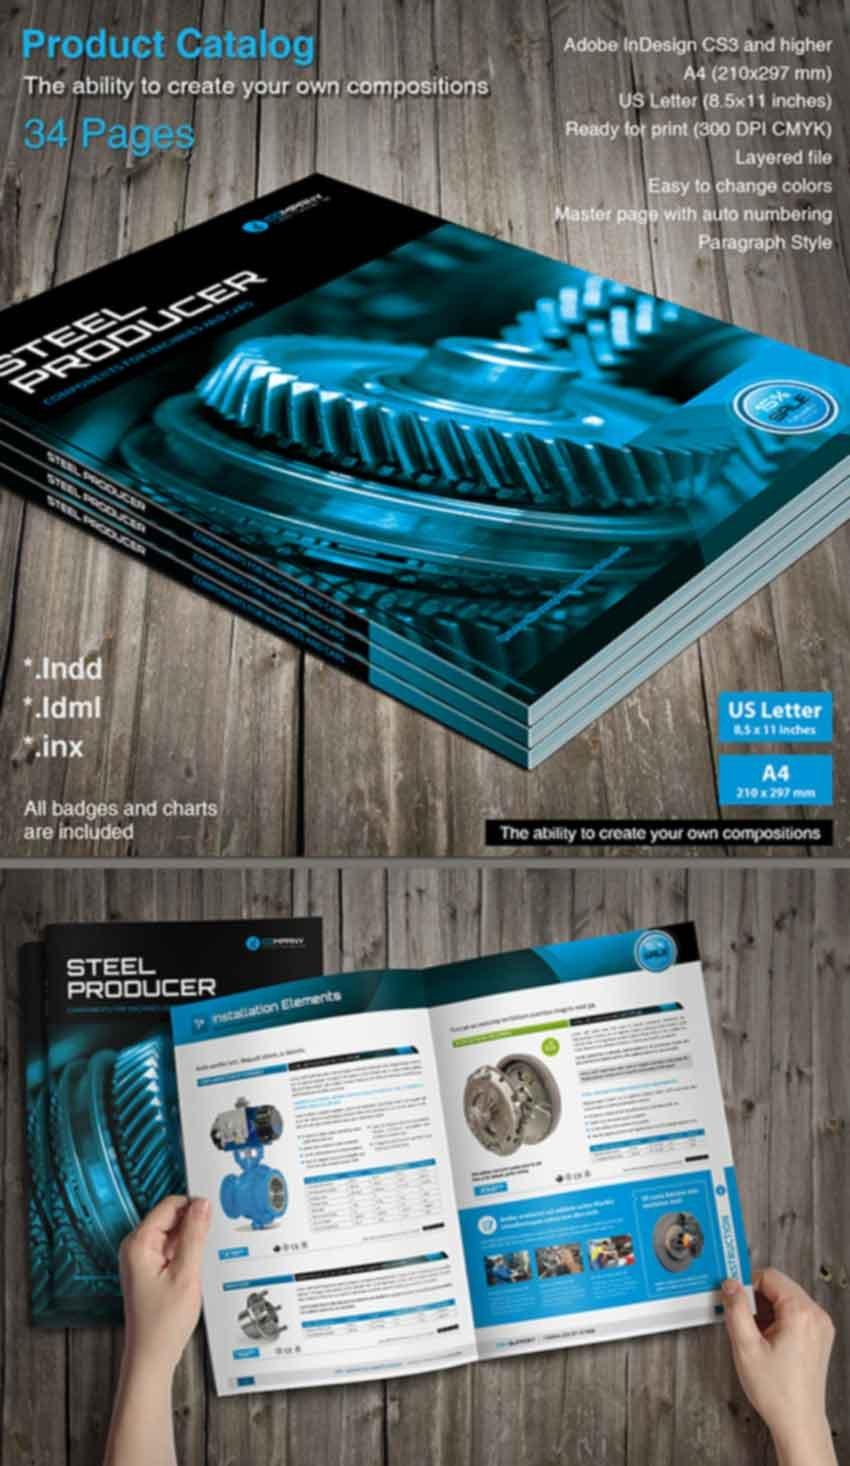 InDesign Product Catalog Design